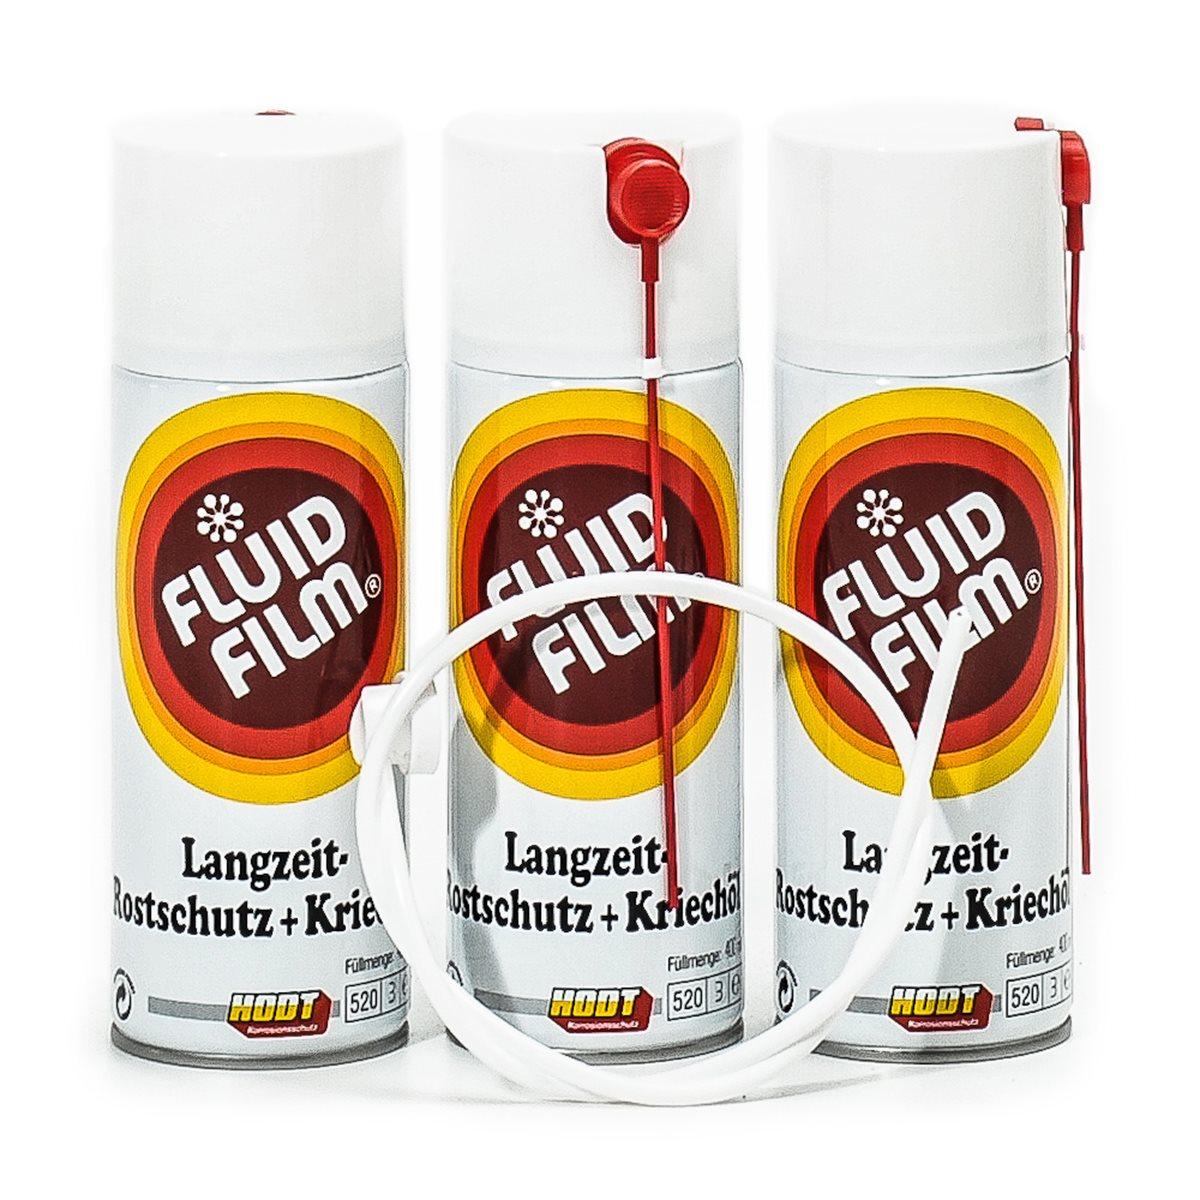 fluid film as r 400 ml spr hdose 3er pack sonde fluid film rostschutzmittel chemie. Black Bedroom Furniture Sets. Home Design Ideas